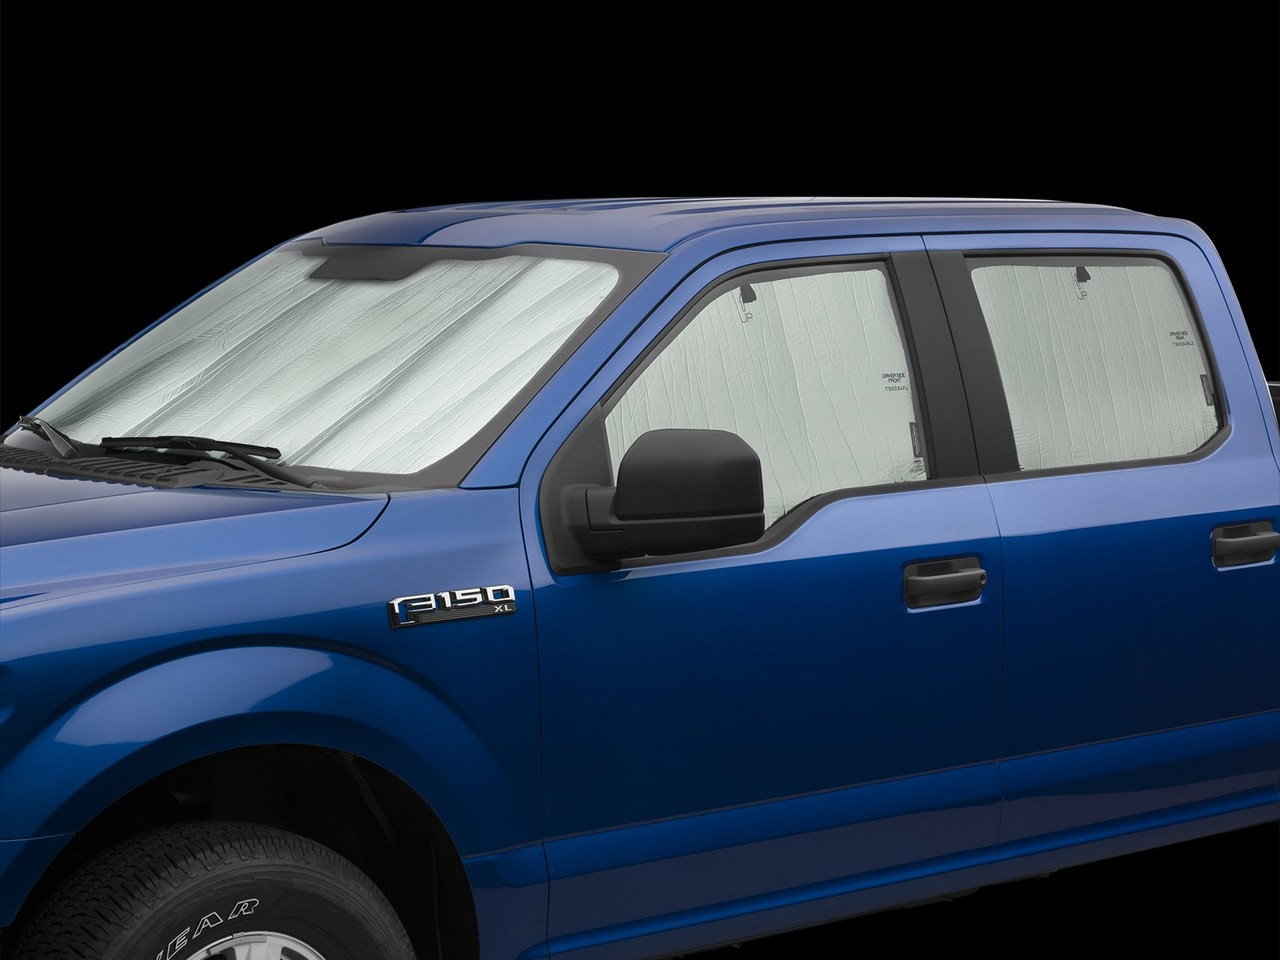 PRO CAKEN Top End Head Gasket Kit for TRX 300EX 300X 1993 2009 TRX250X Fourtrax